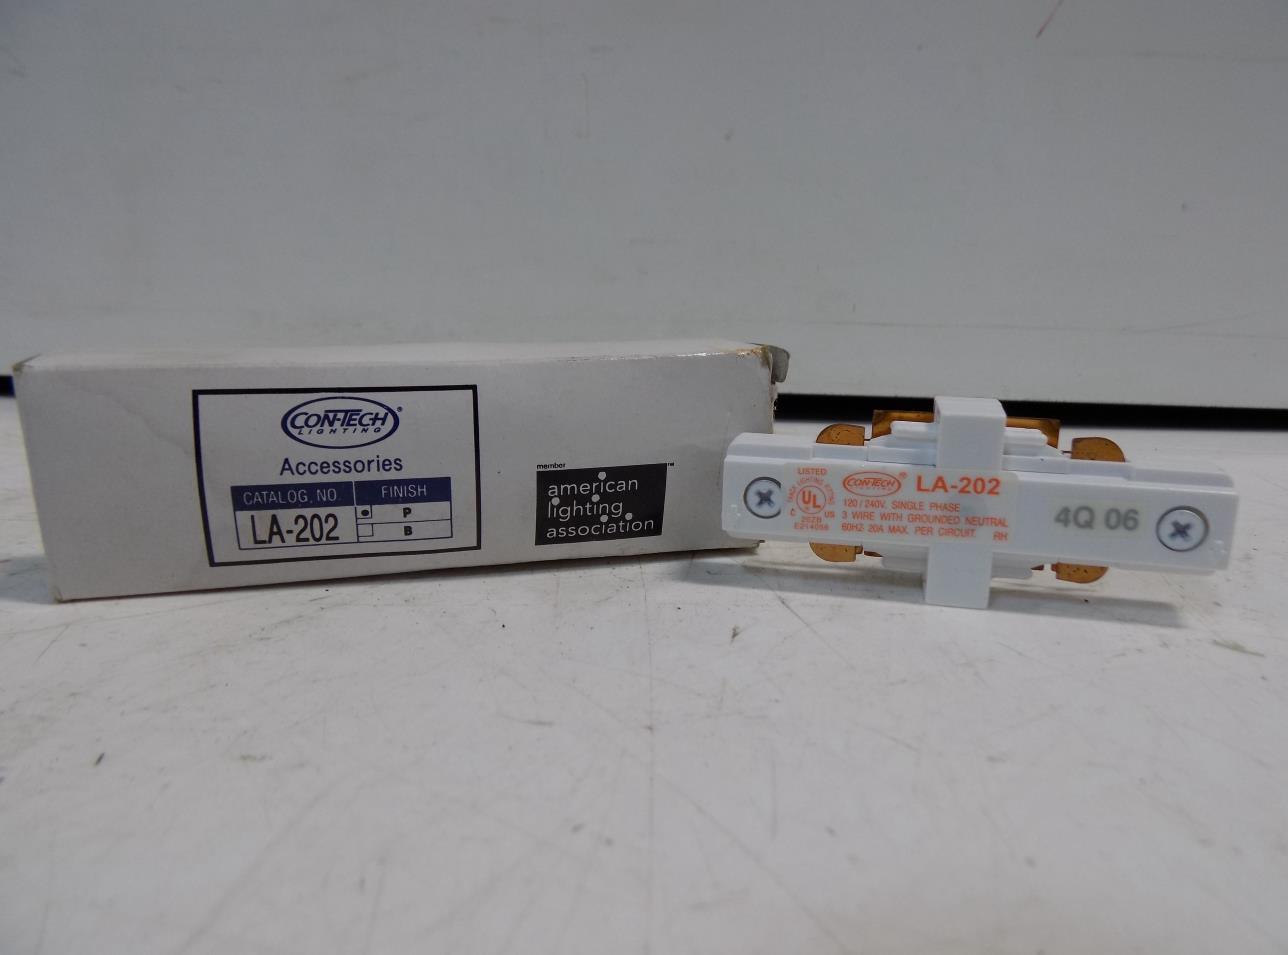 Details about con tech lighting 2 circuit track mini connector la 202 nib